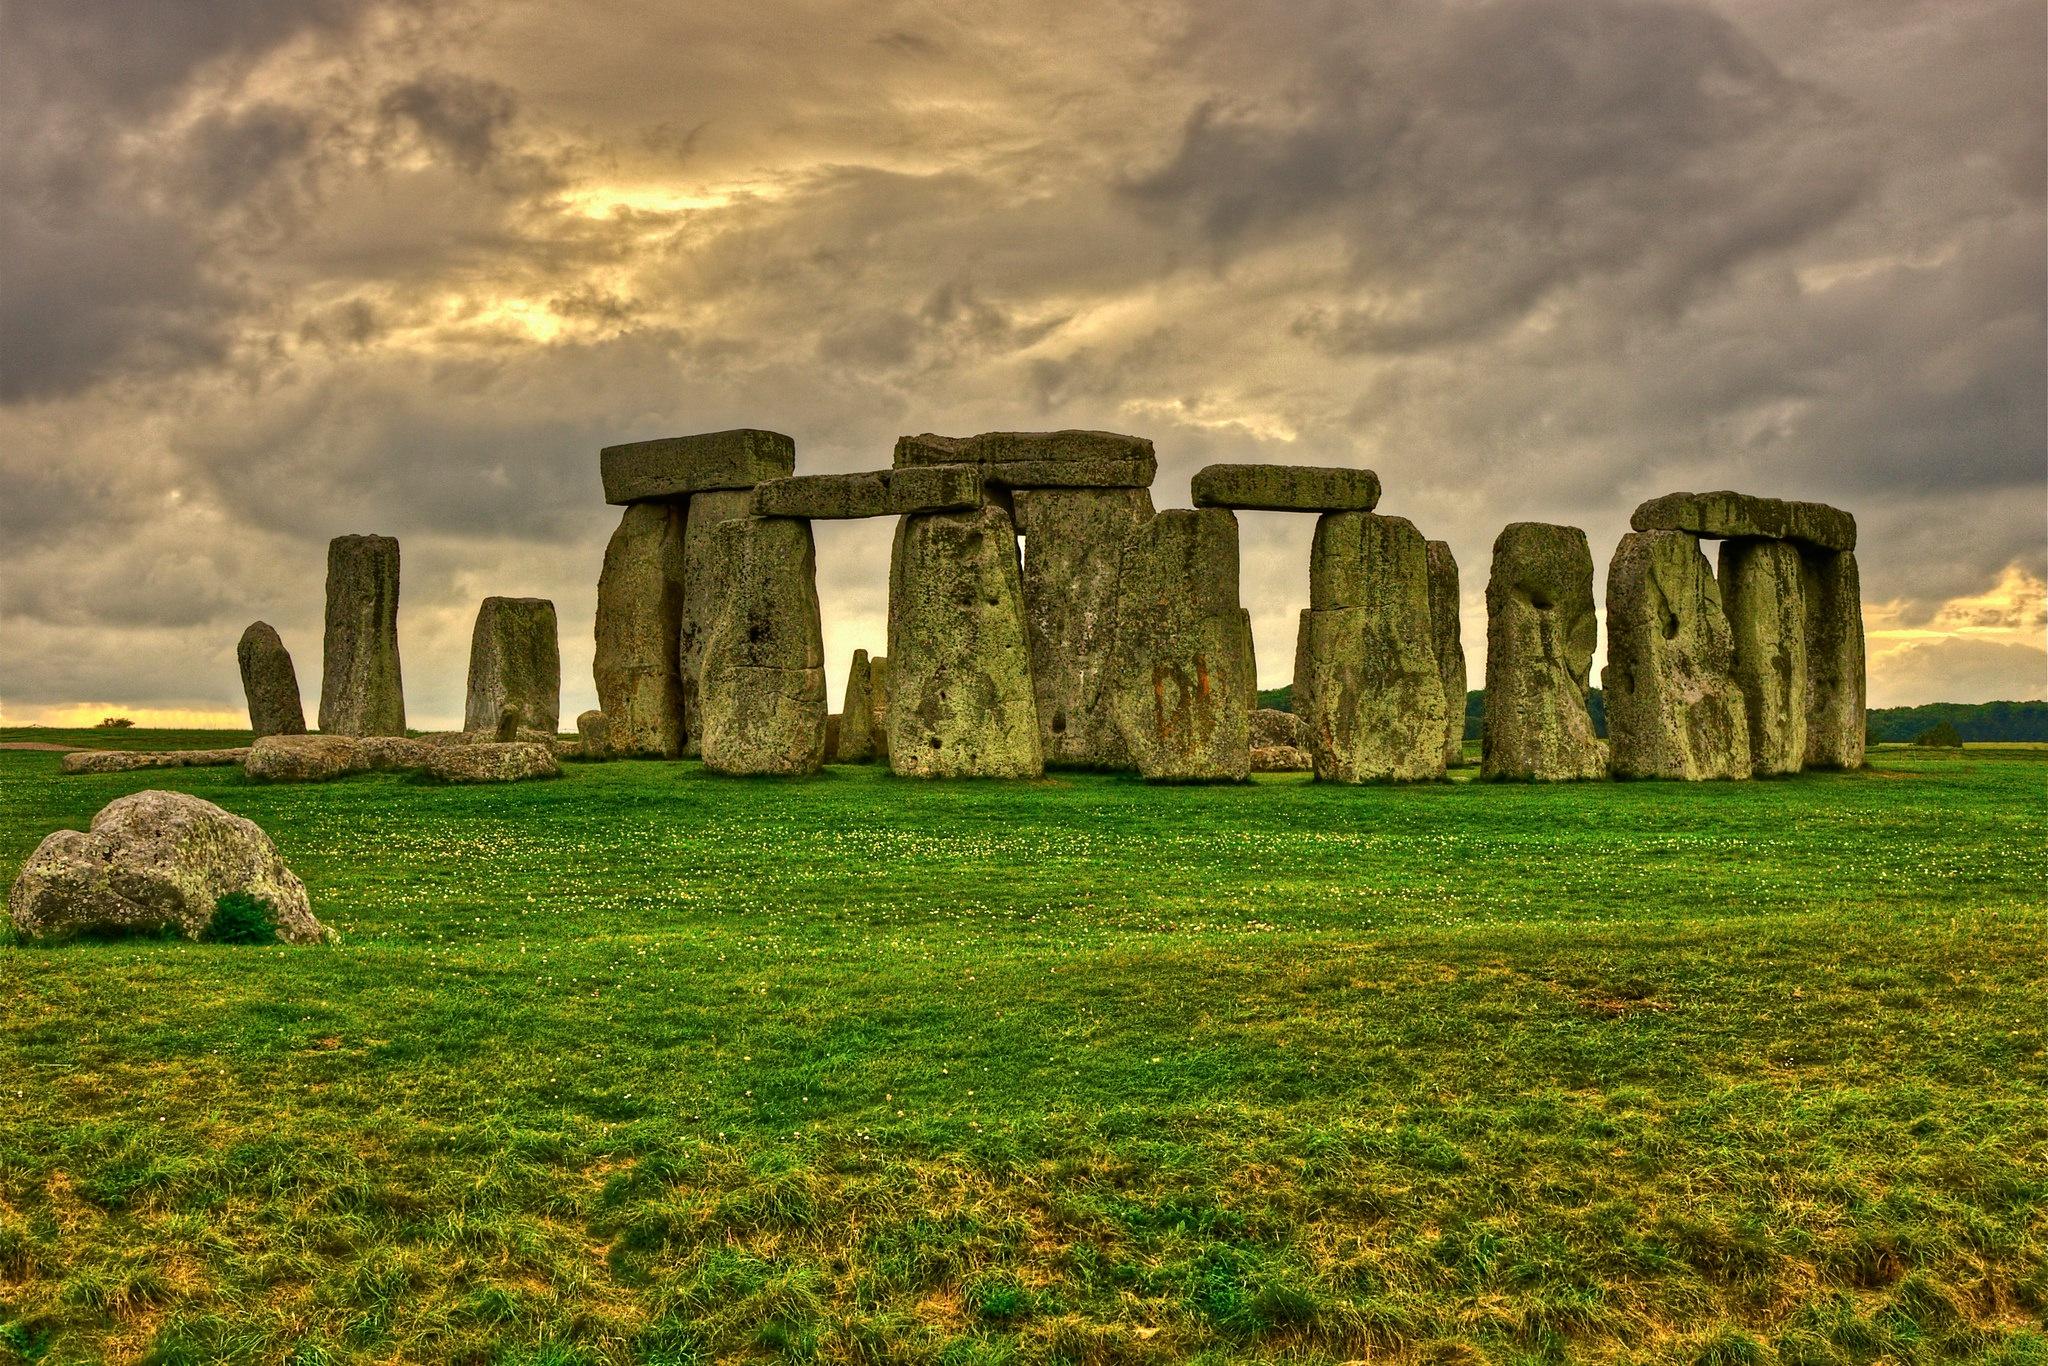 Famous Rock Group, Stonehenge, Wiltshire, England  № 715645 загрузить